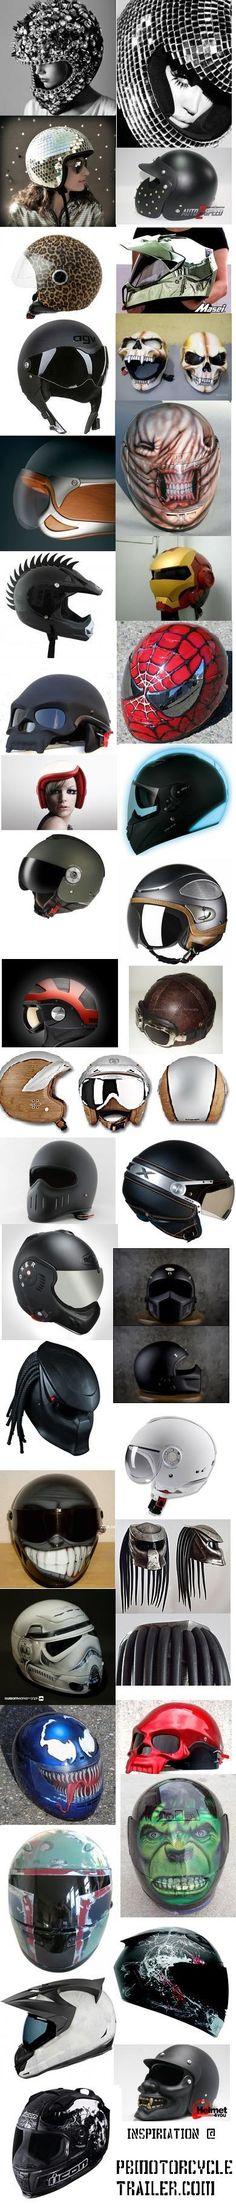 Neat helmet collection!